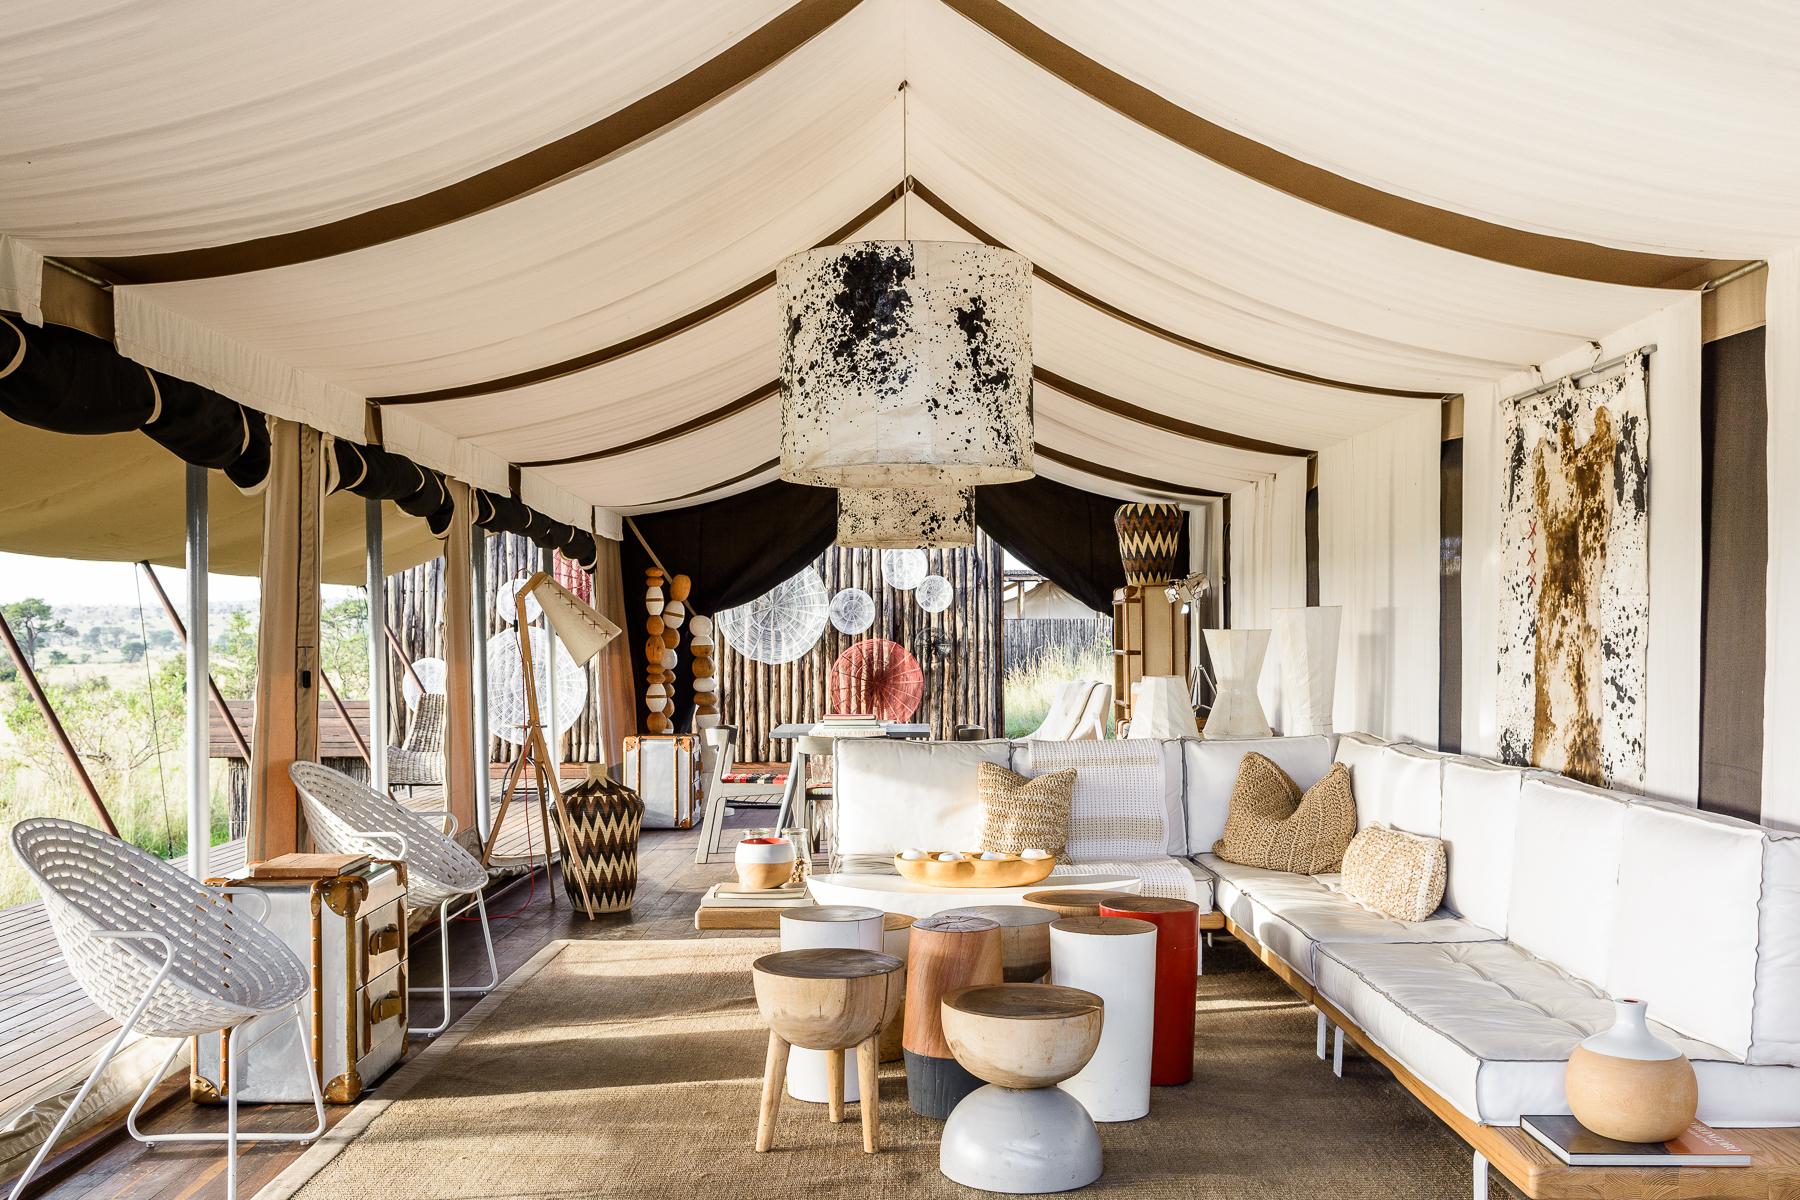 singita portfolio - grumeti reserves - mara river tented camp